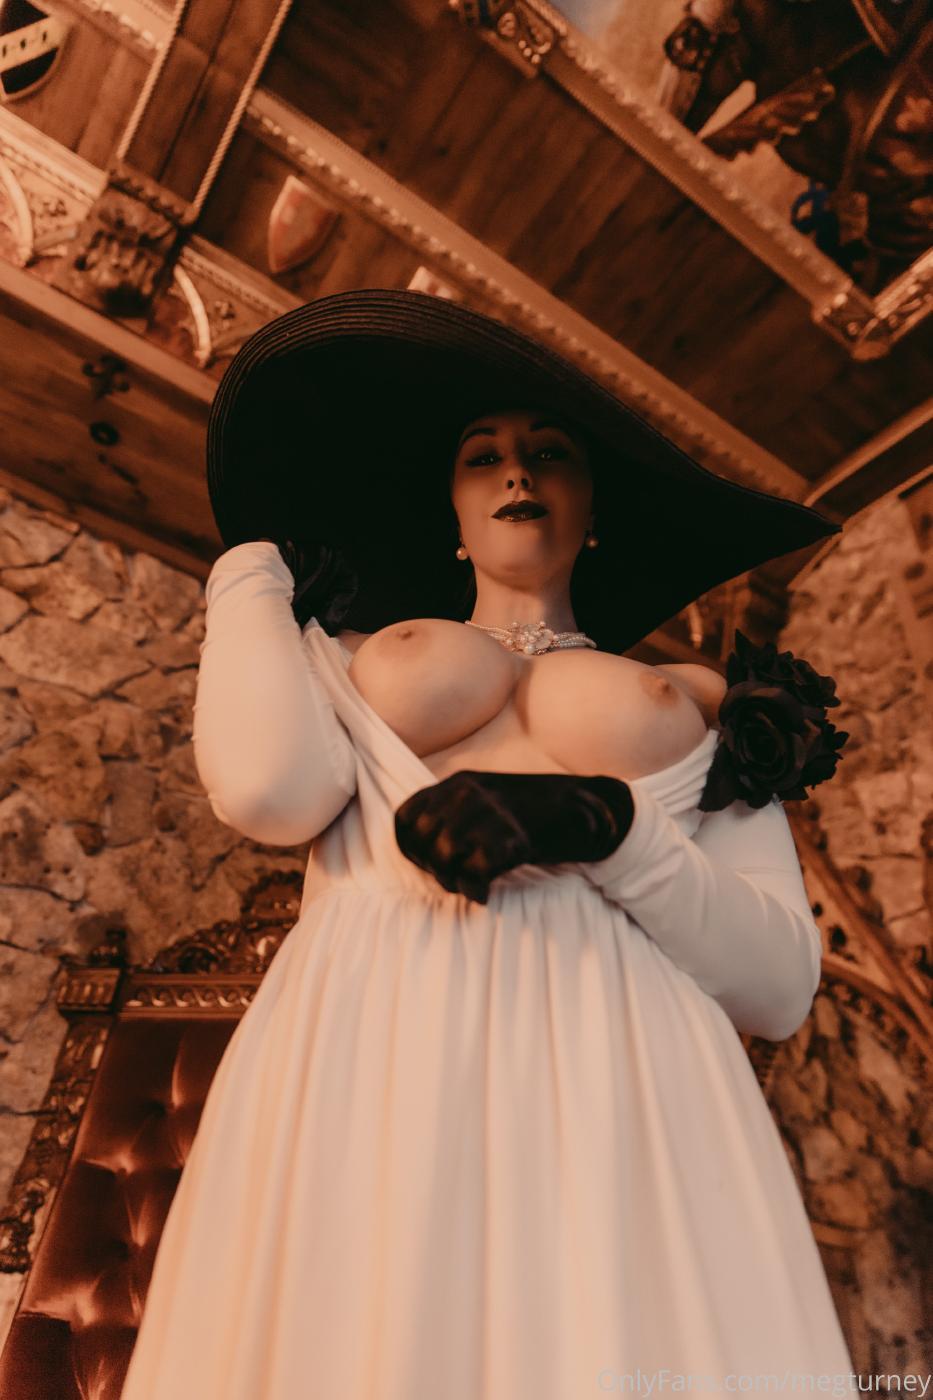 Meg Turney Lady Dimitrescu Cosplay Onlyfans Set Leaked 0034